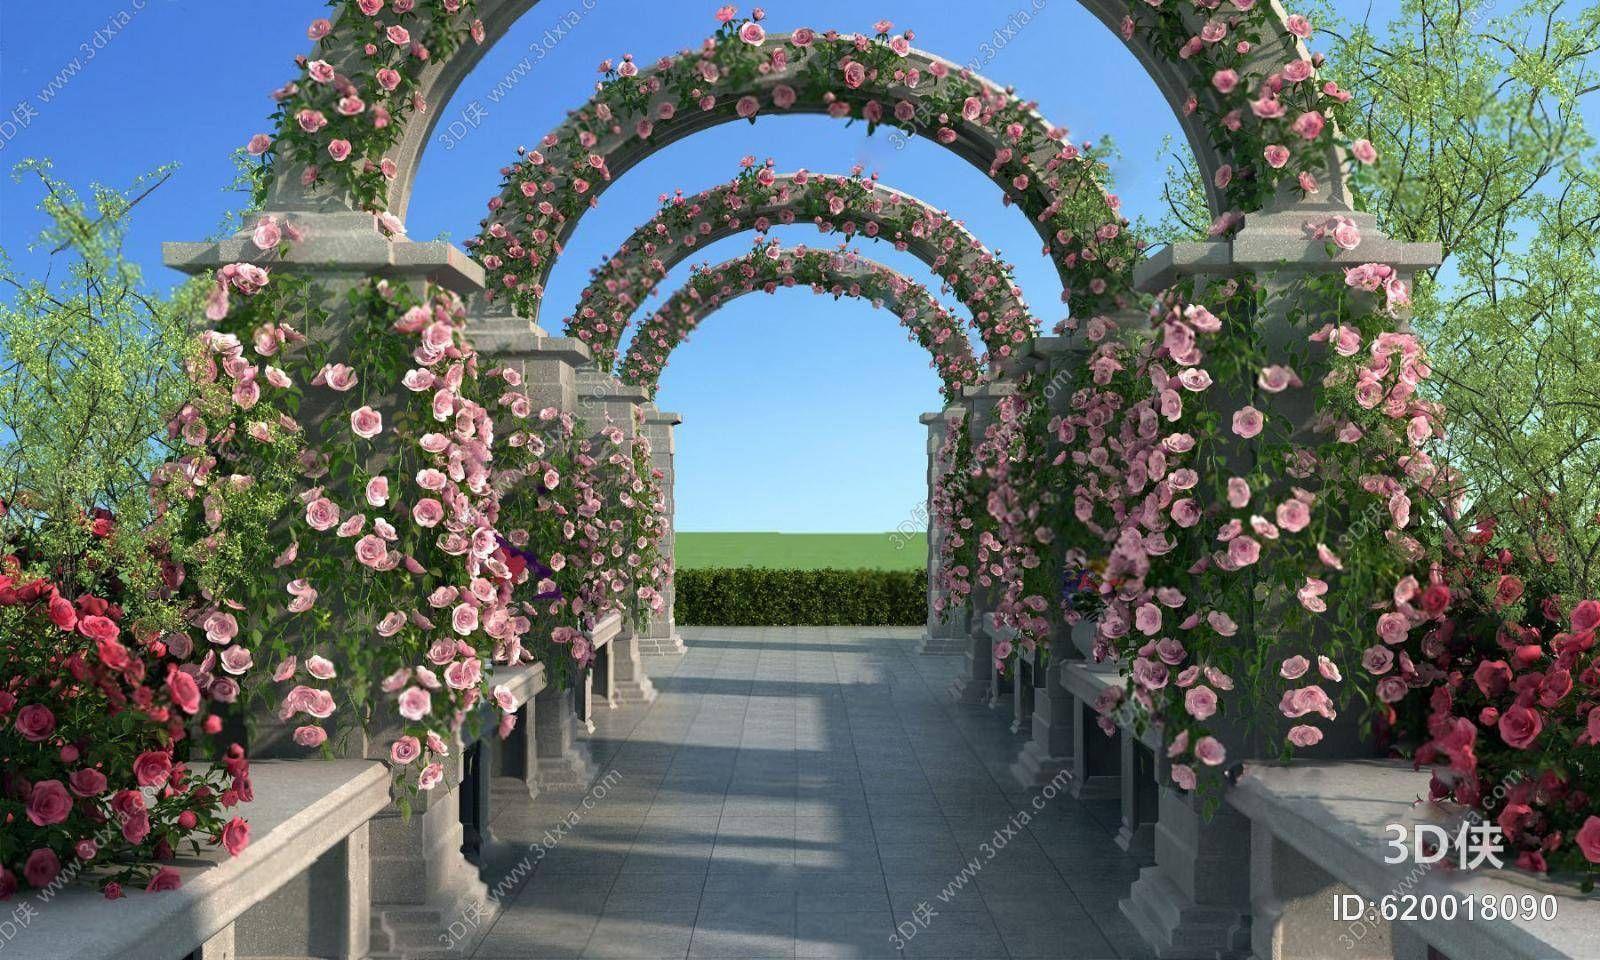 Outdoor Aisle 3d Model Outdoor Garden Arch Outdoor Structures